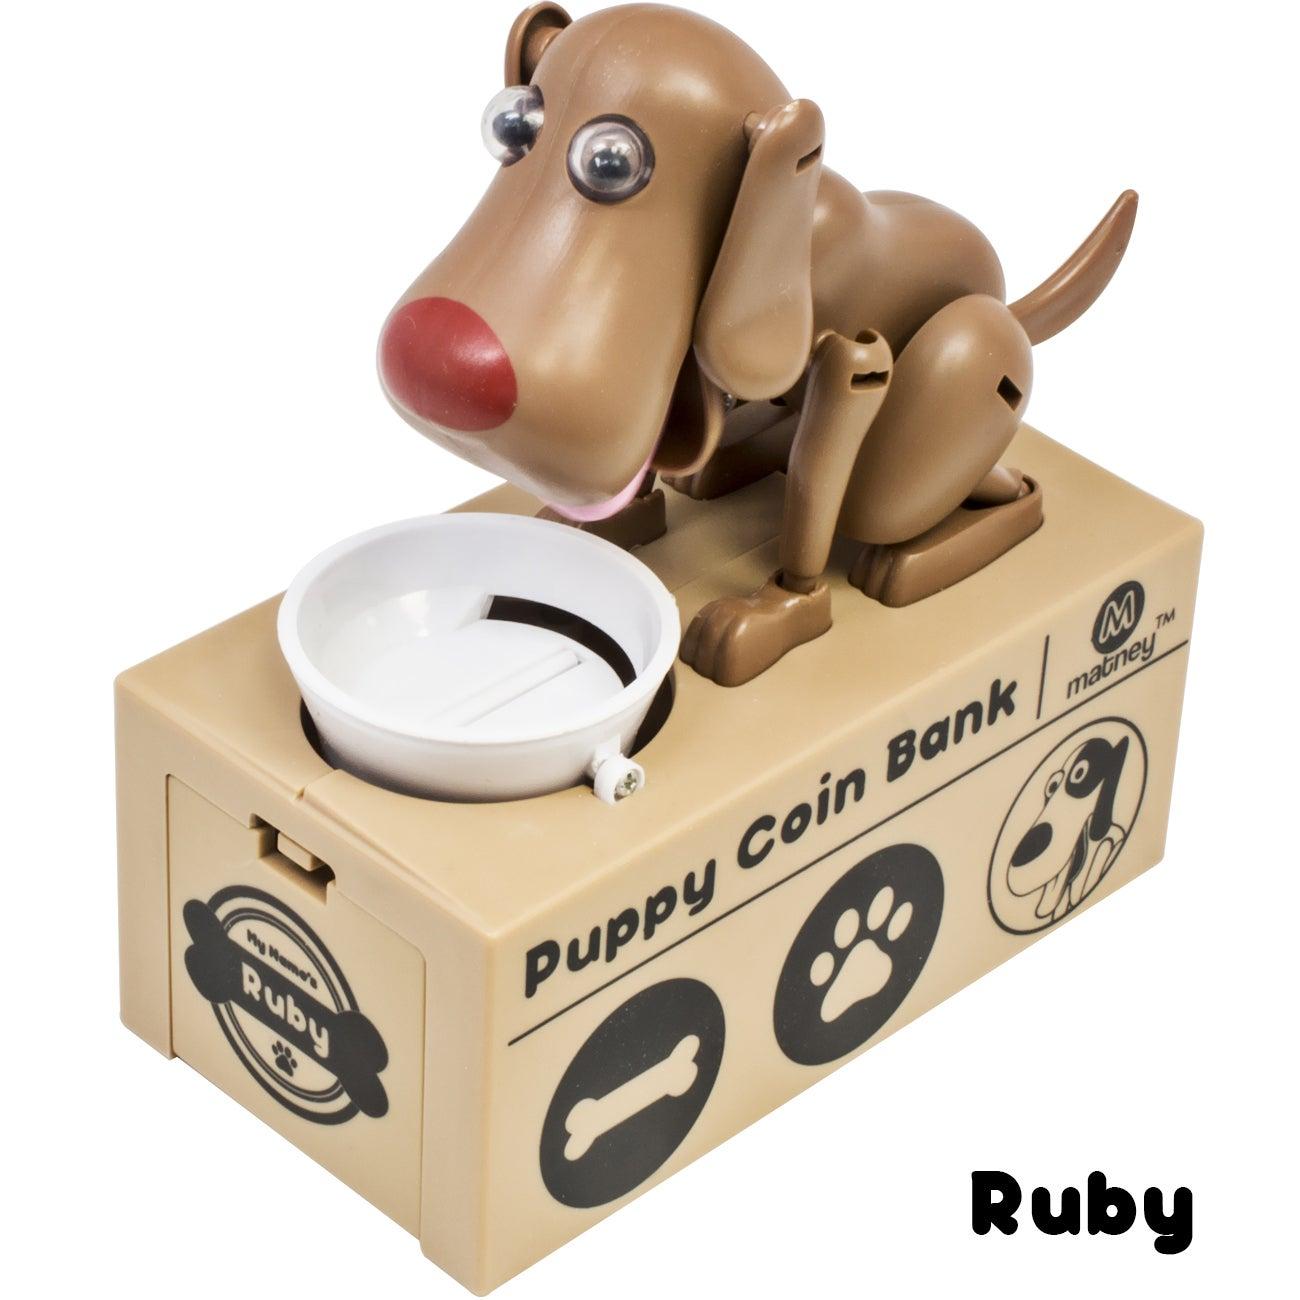 Ggi International Dog Piggy Bank Robotic Coin Toy Money B...